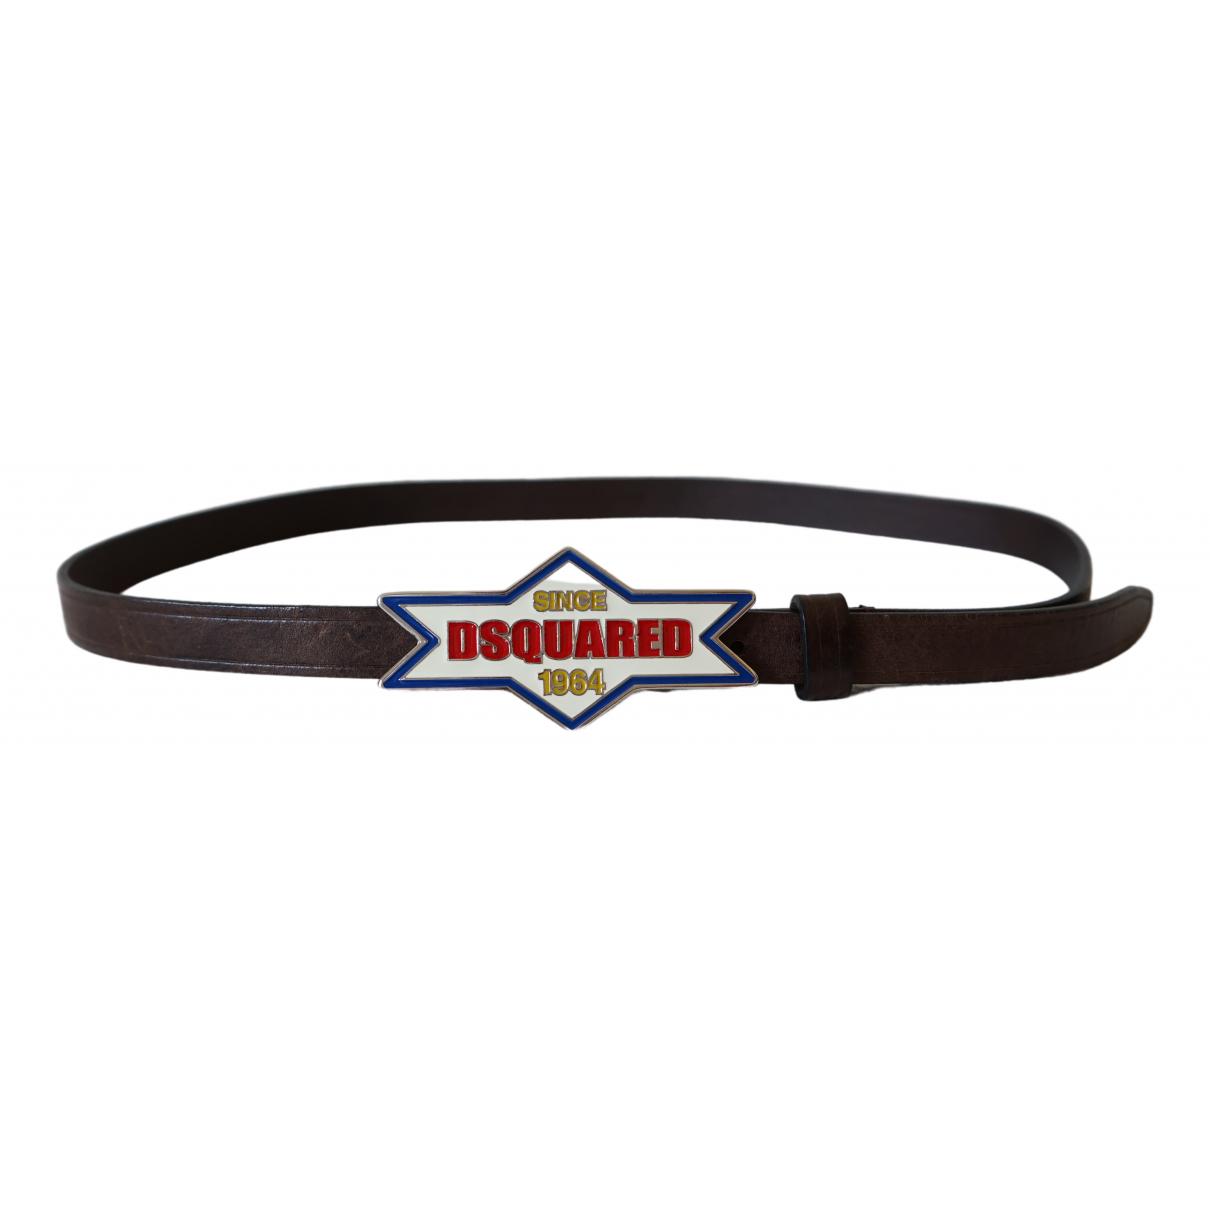 Dsquared2 \N Brown Leather belt for Women L International